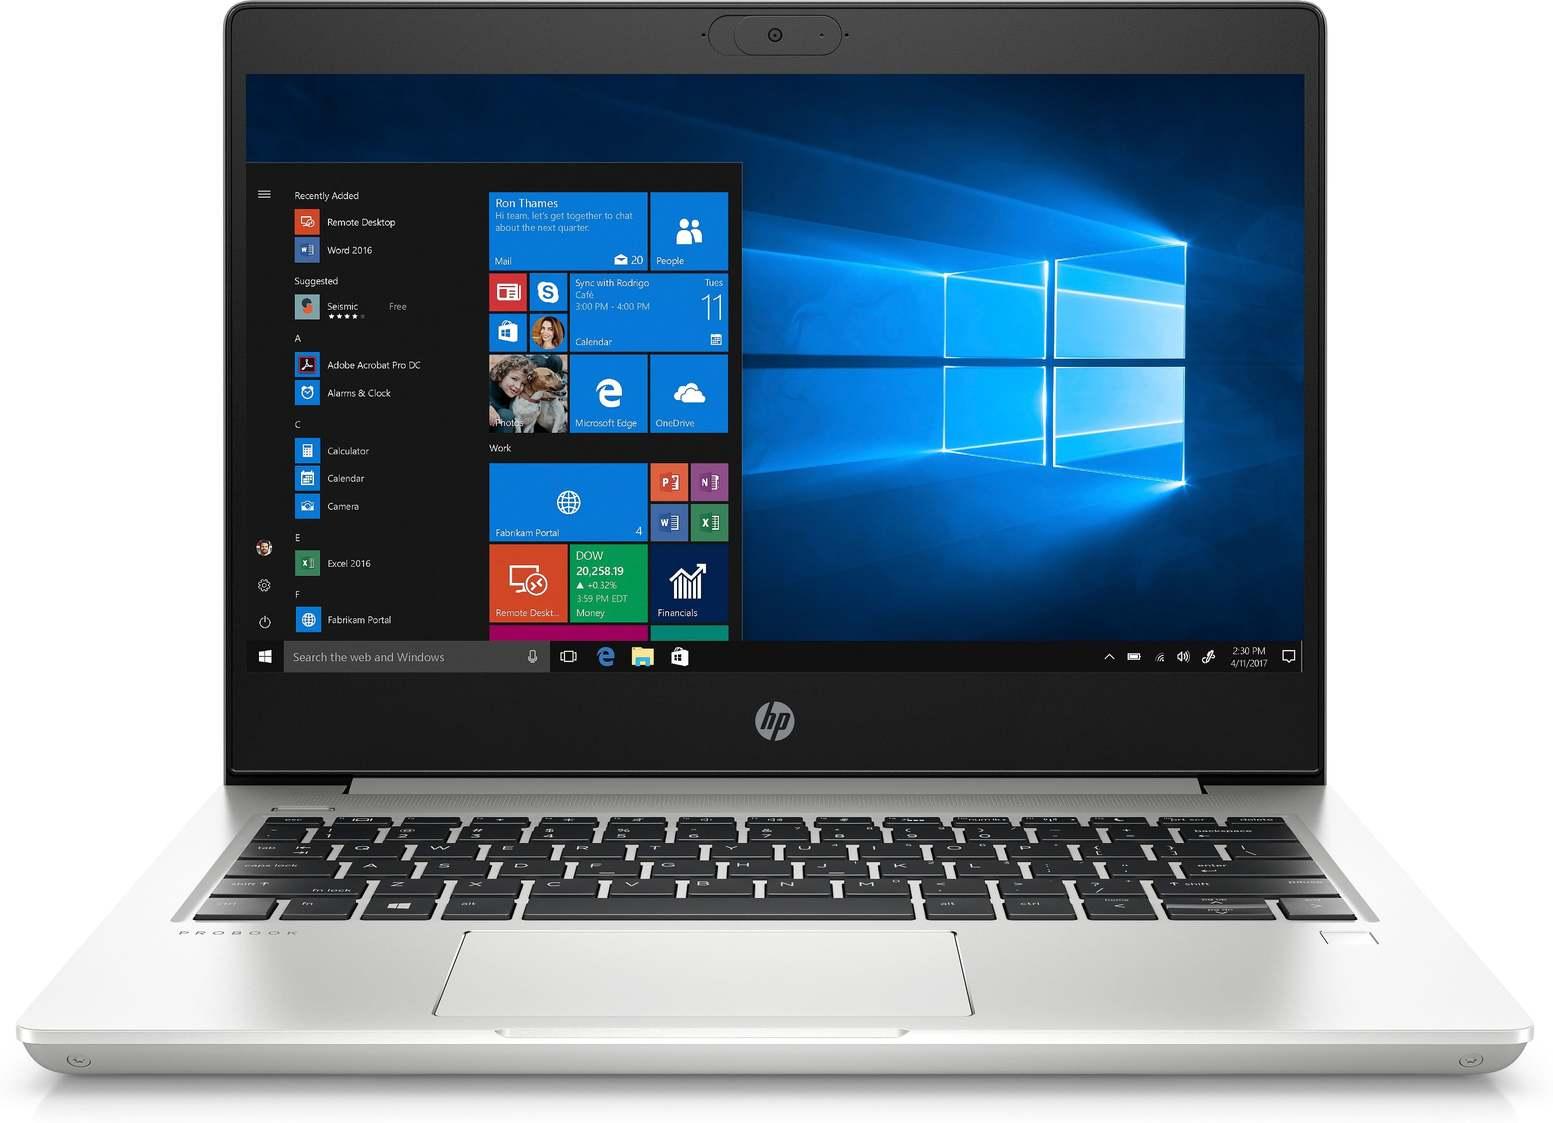 "HP ProBook 430 G7 13,3"" FHD 250nts i5-10210U/8GB/256GB M.2 SSD/WiFi/BT/W10P"